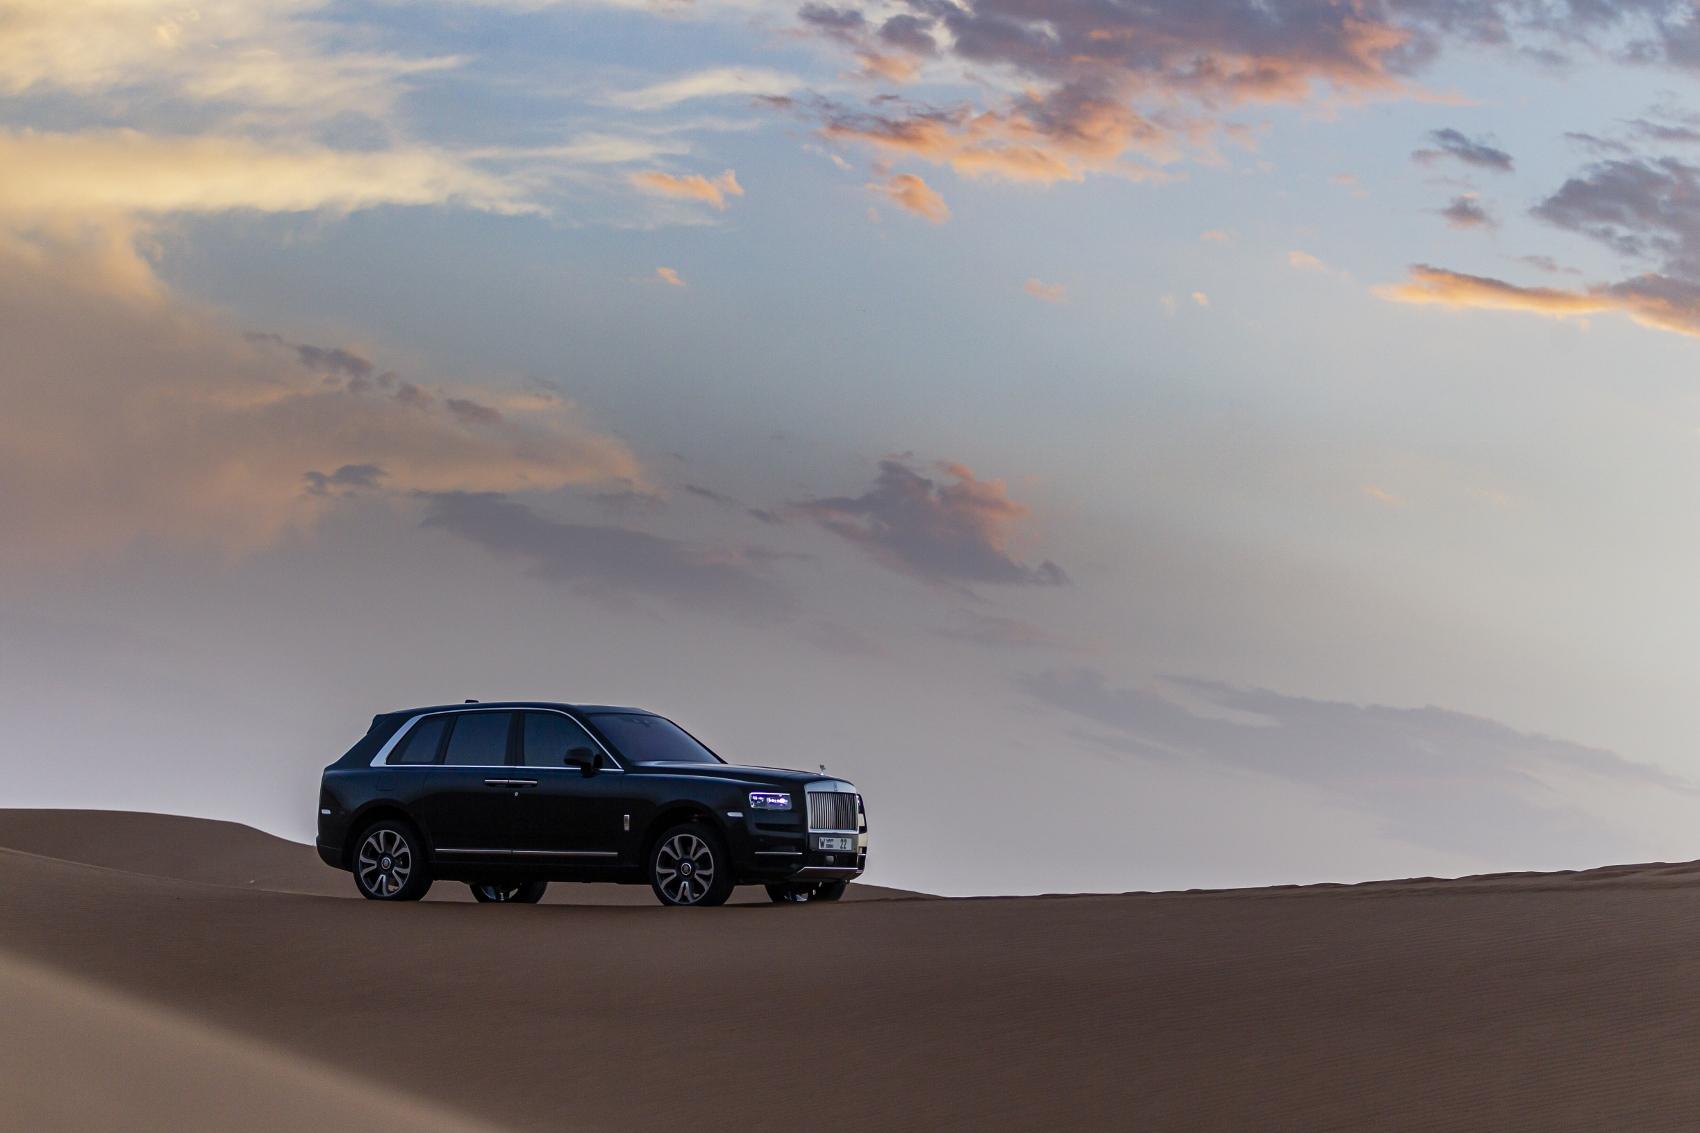 Rolls Royce Cullinan sa predviedol na púšti. Pozrite si foto aj video 9qZWgGdYBu rolls-royce-cullina